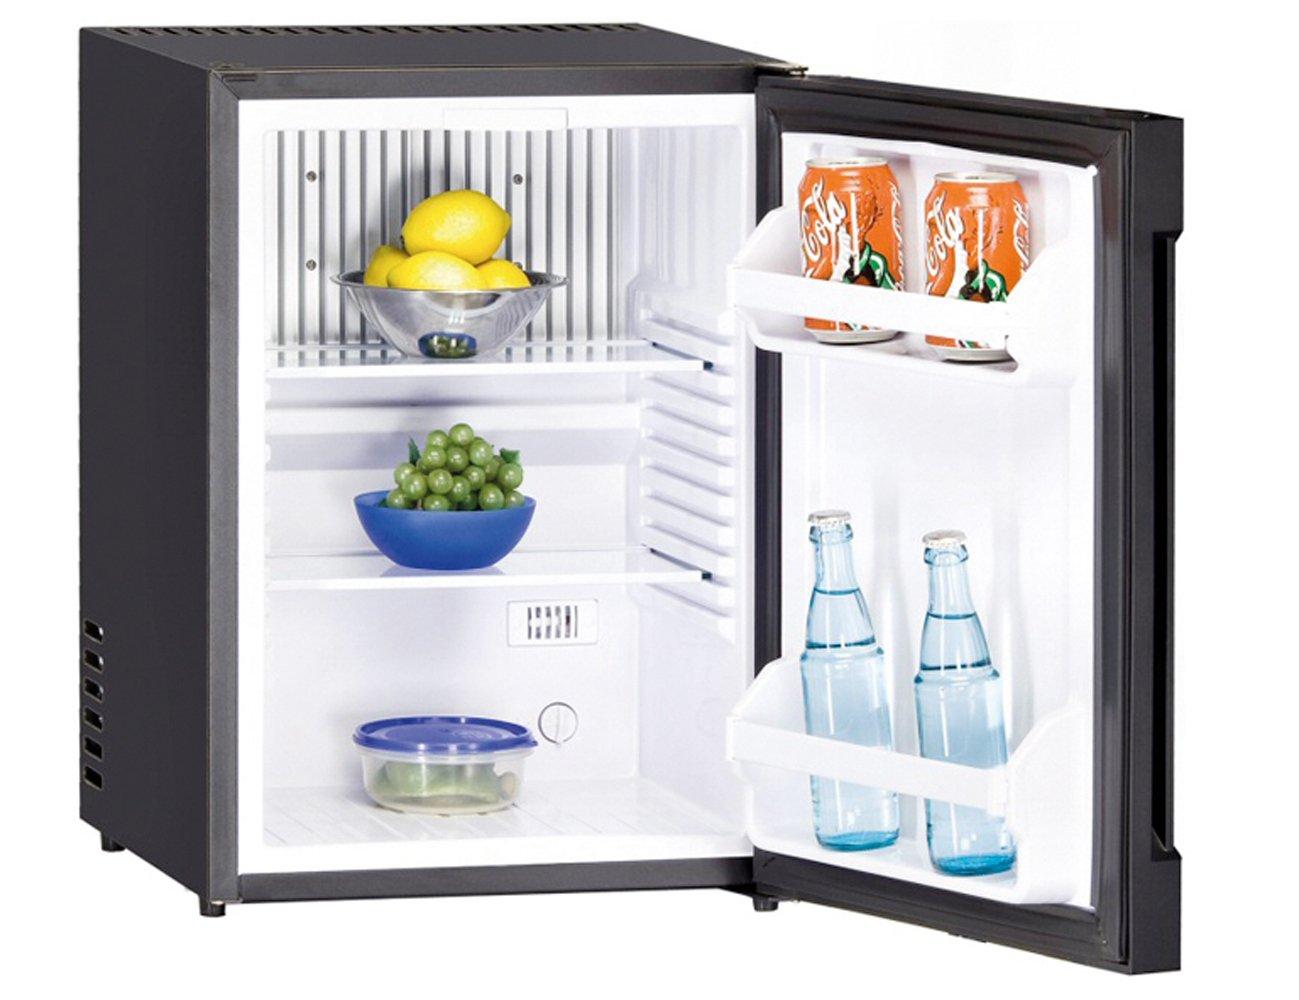 Mini Kühlschrank Edelstahl : Exquisit fa einbau kühlschrank kwh jahr l kühlteil